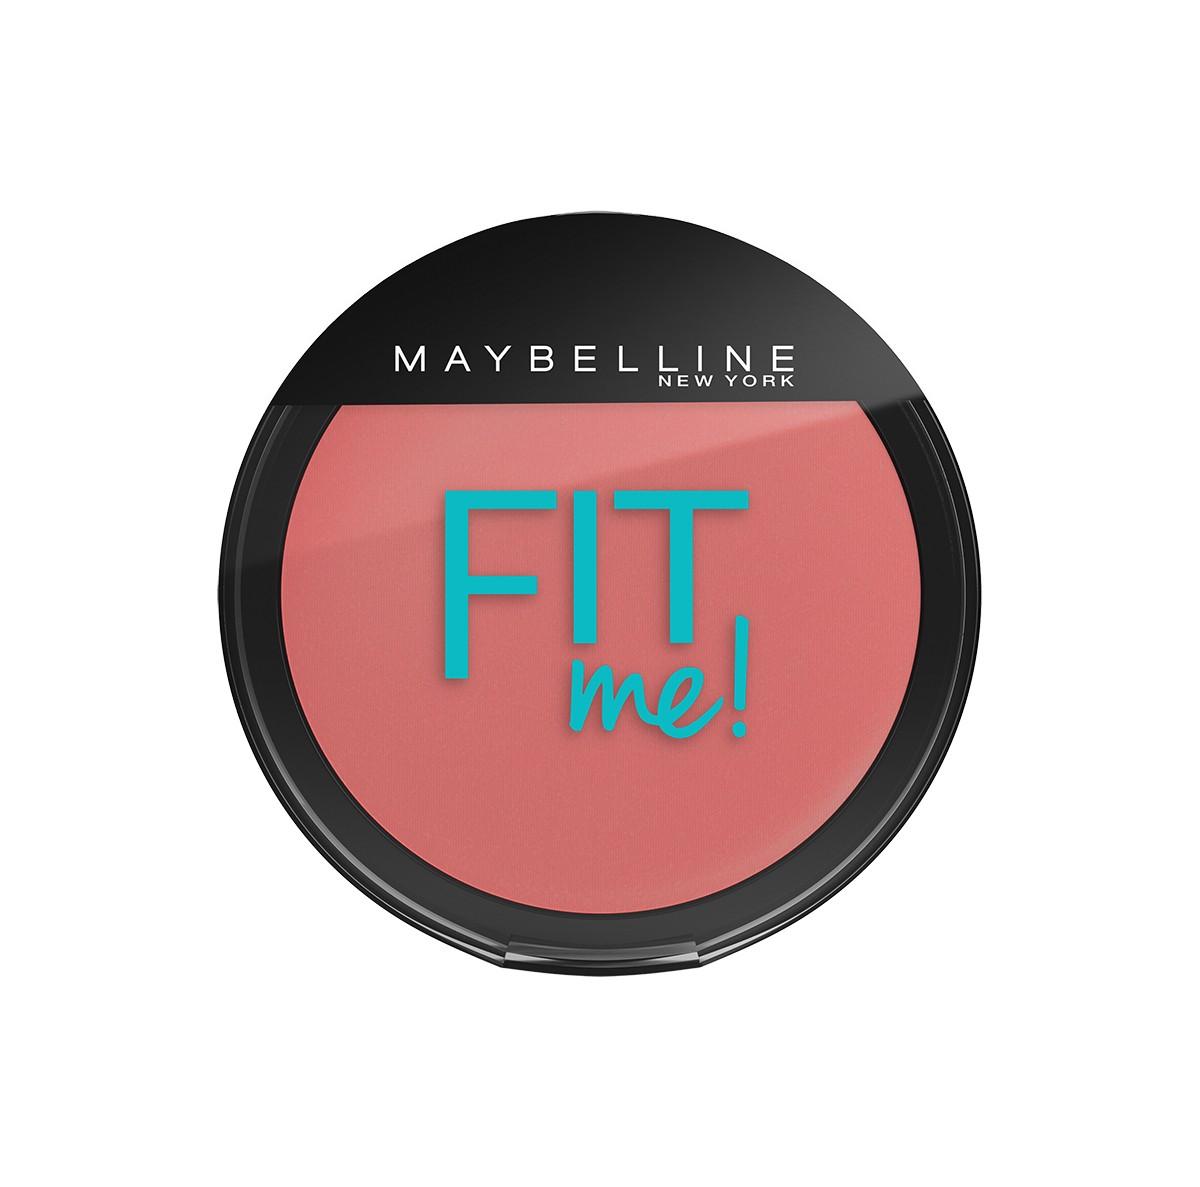 Blush Maybelline Fit Me Nº05 Assim Sou Eu Maybelline 1 Unidade - brand